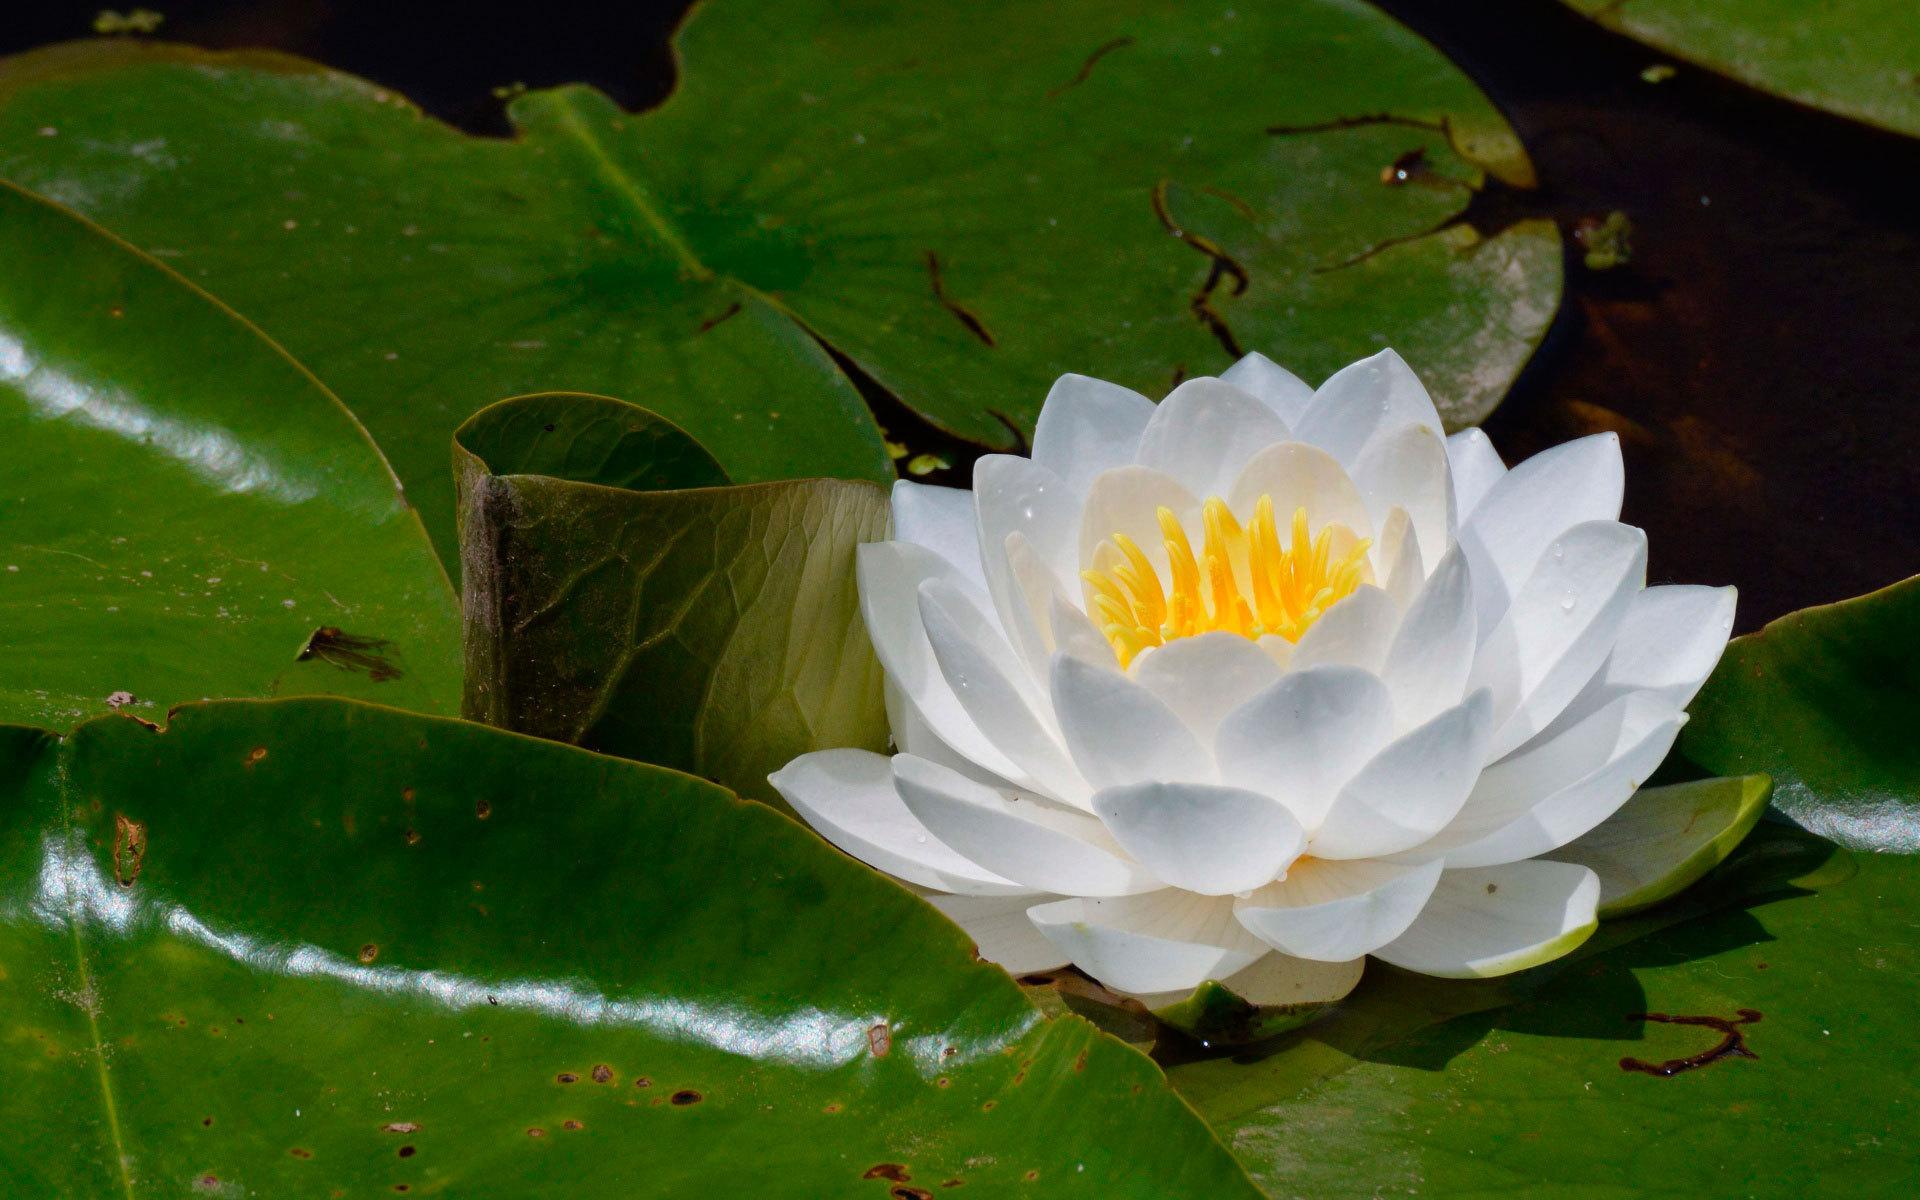 кувшинки фото цветка чаще всего